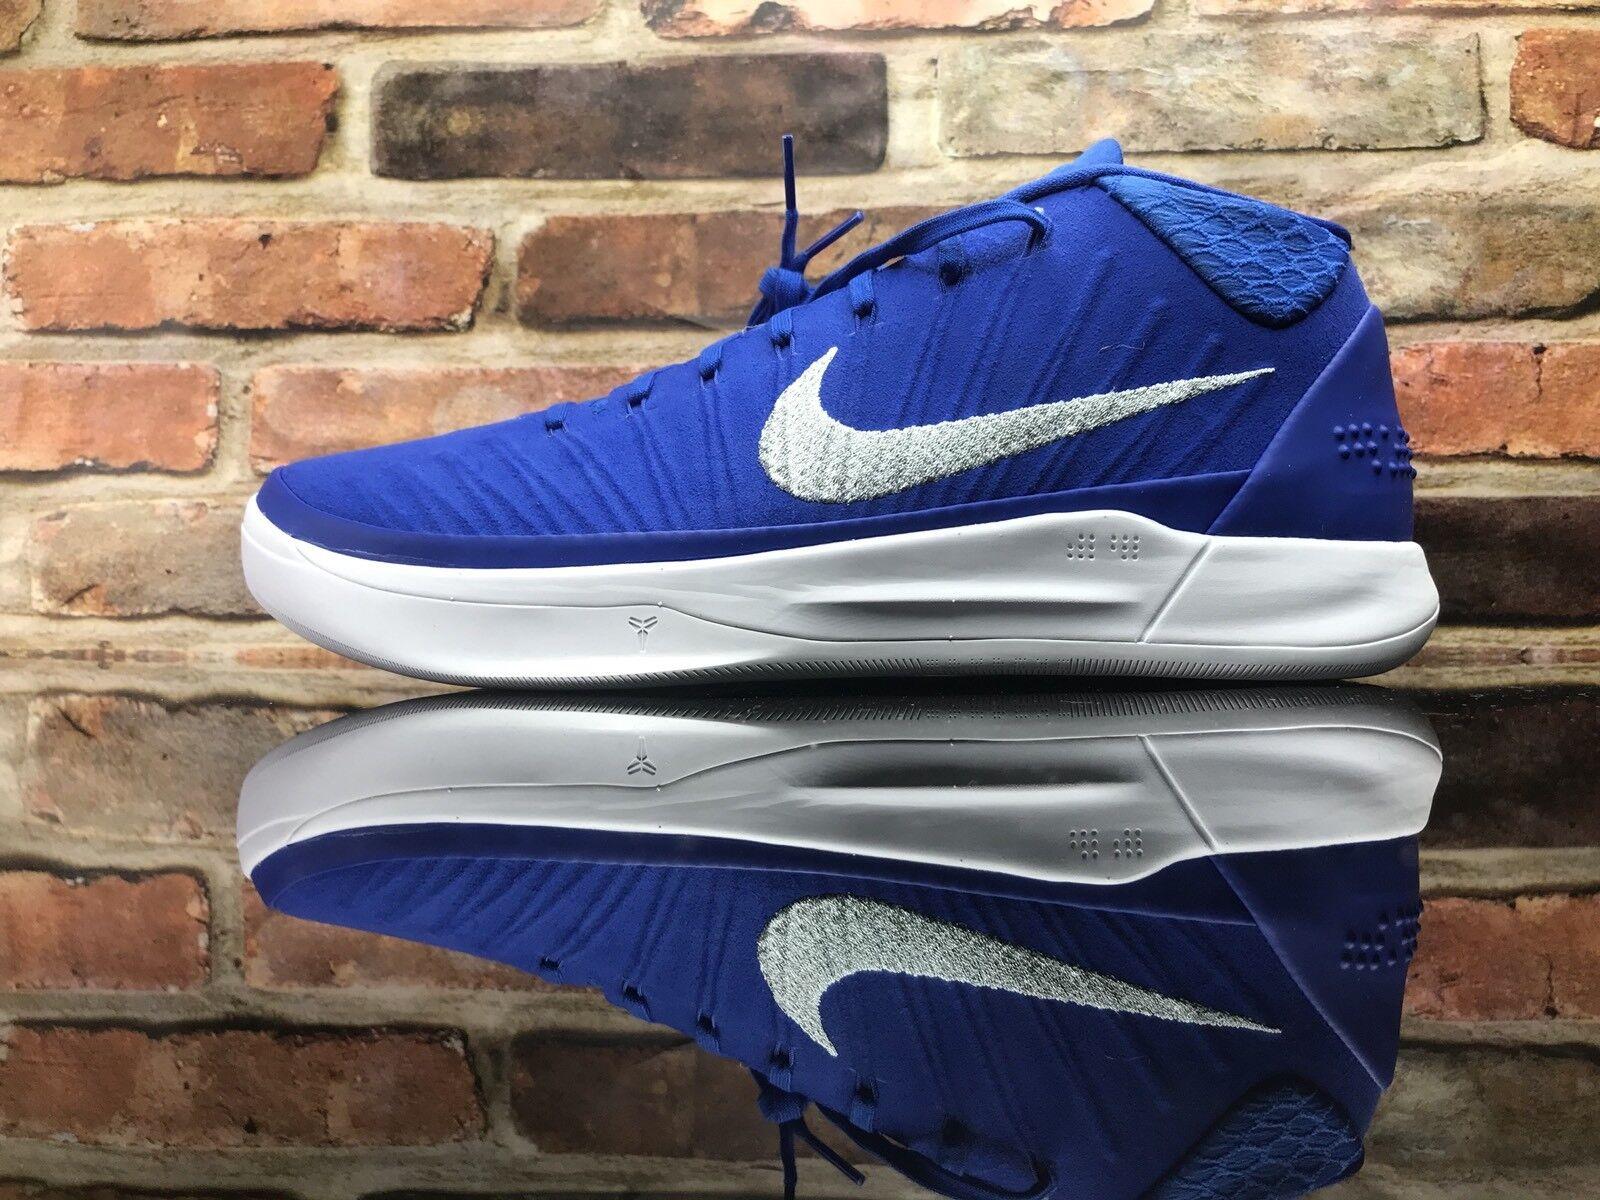 Nike Kobe AD AD AD TB Promo Game Royal Silver Mens Basketball shoes Size 11.5 bluee 1bc960